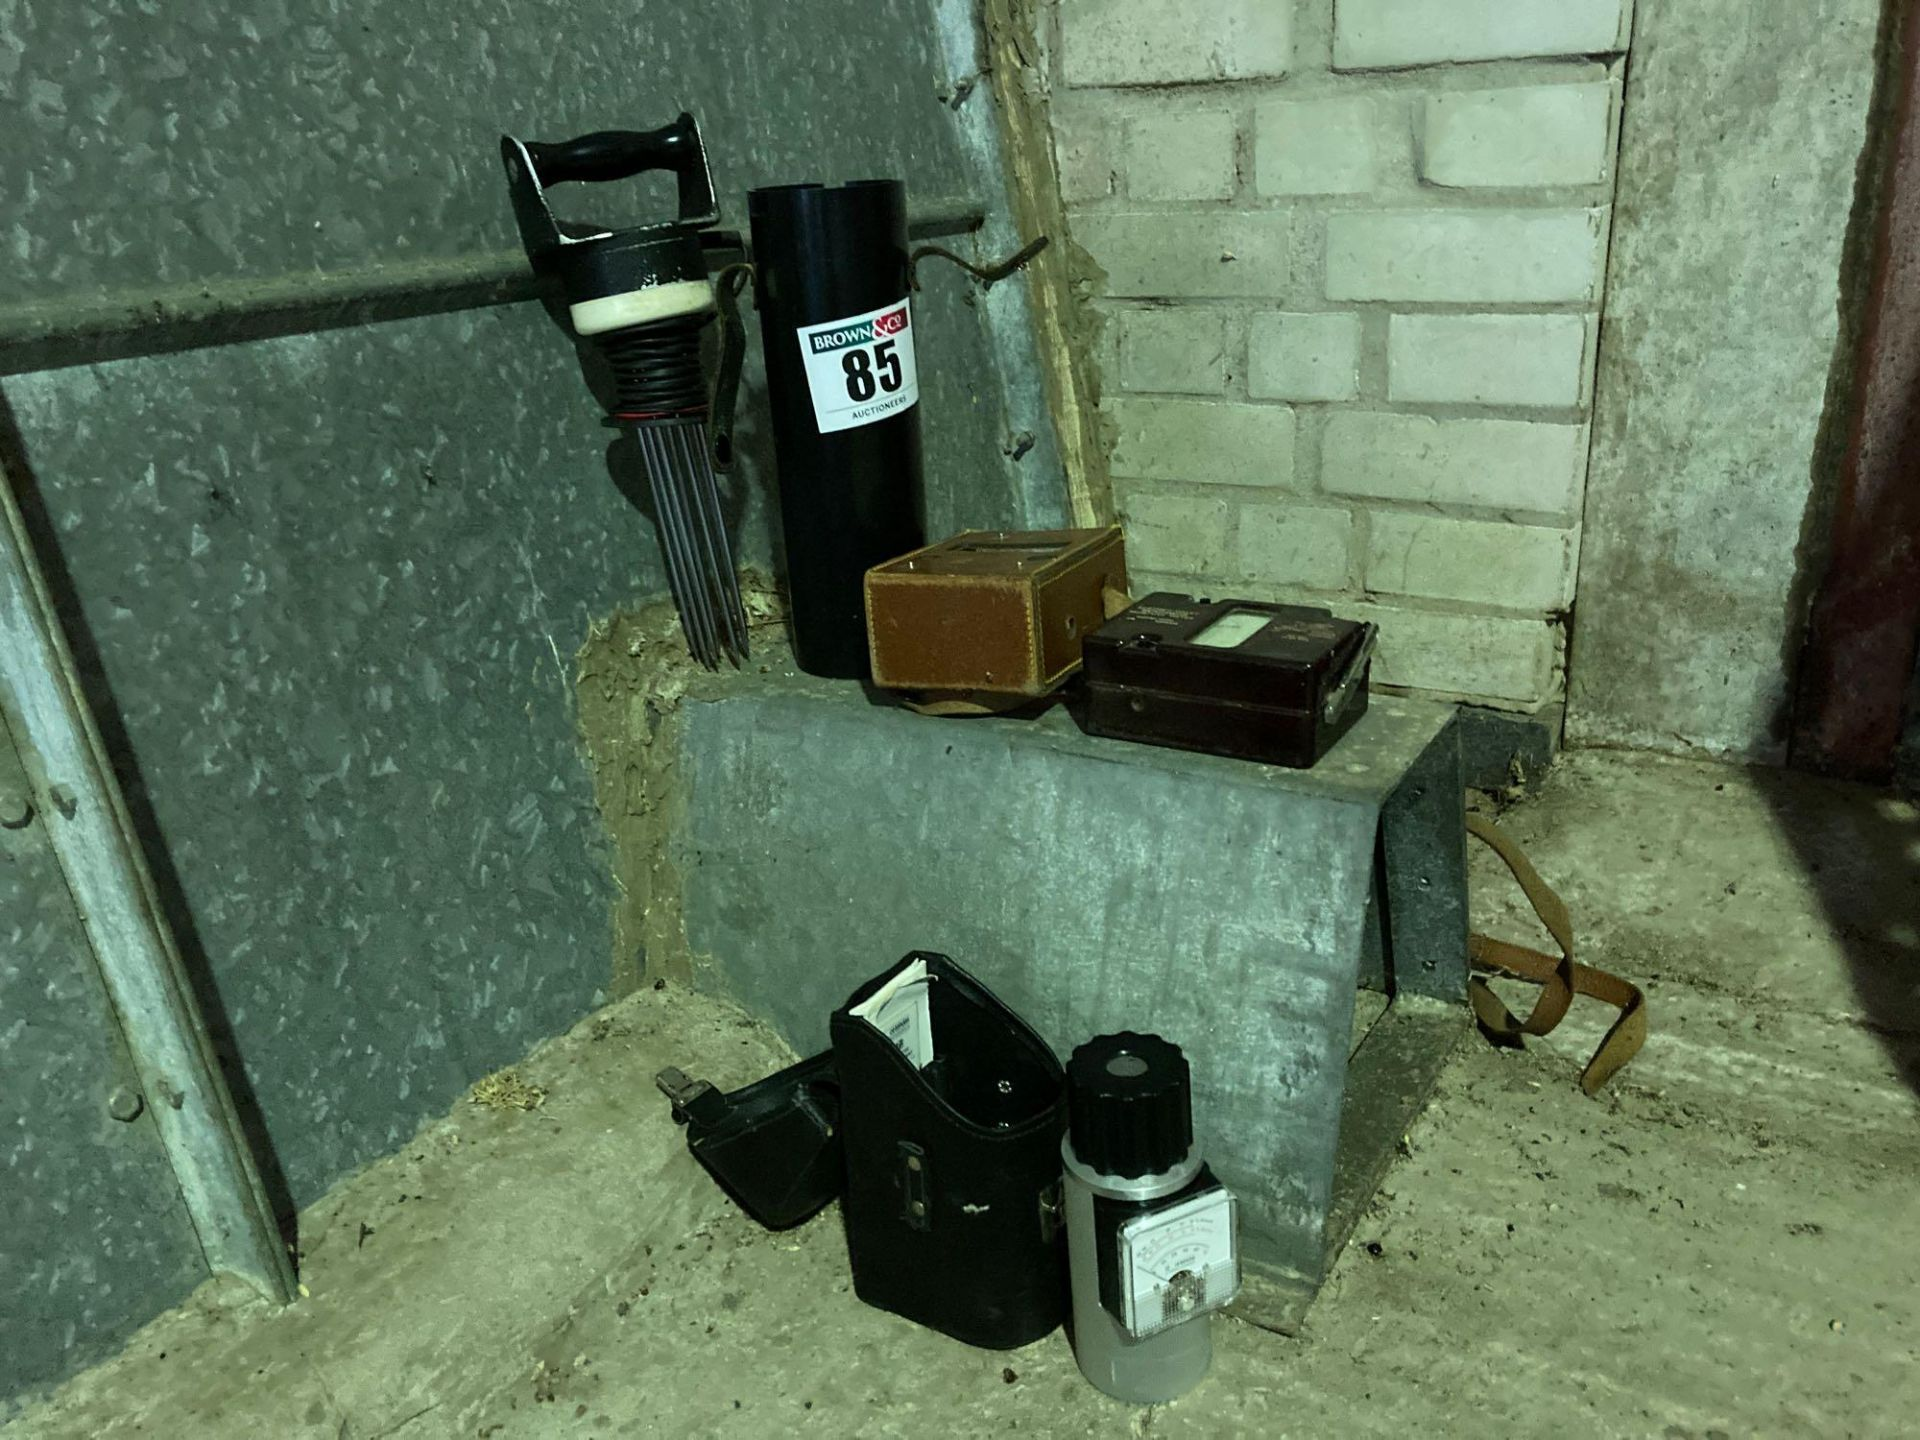 2 x Moisture meters - Image 3 of 4